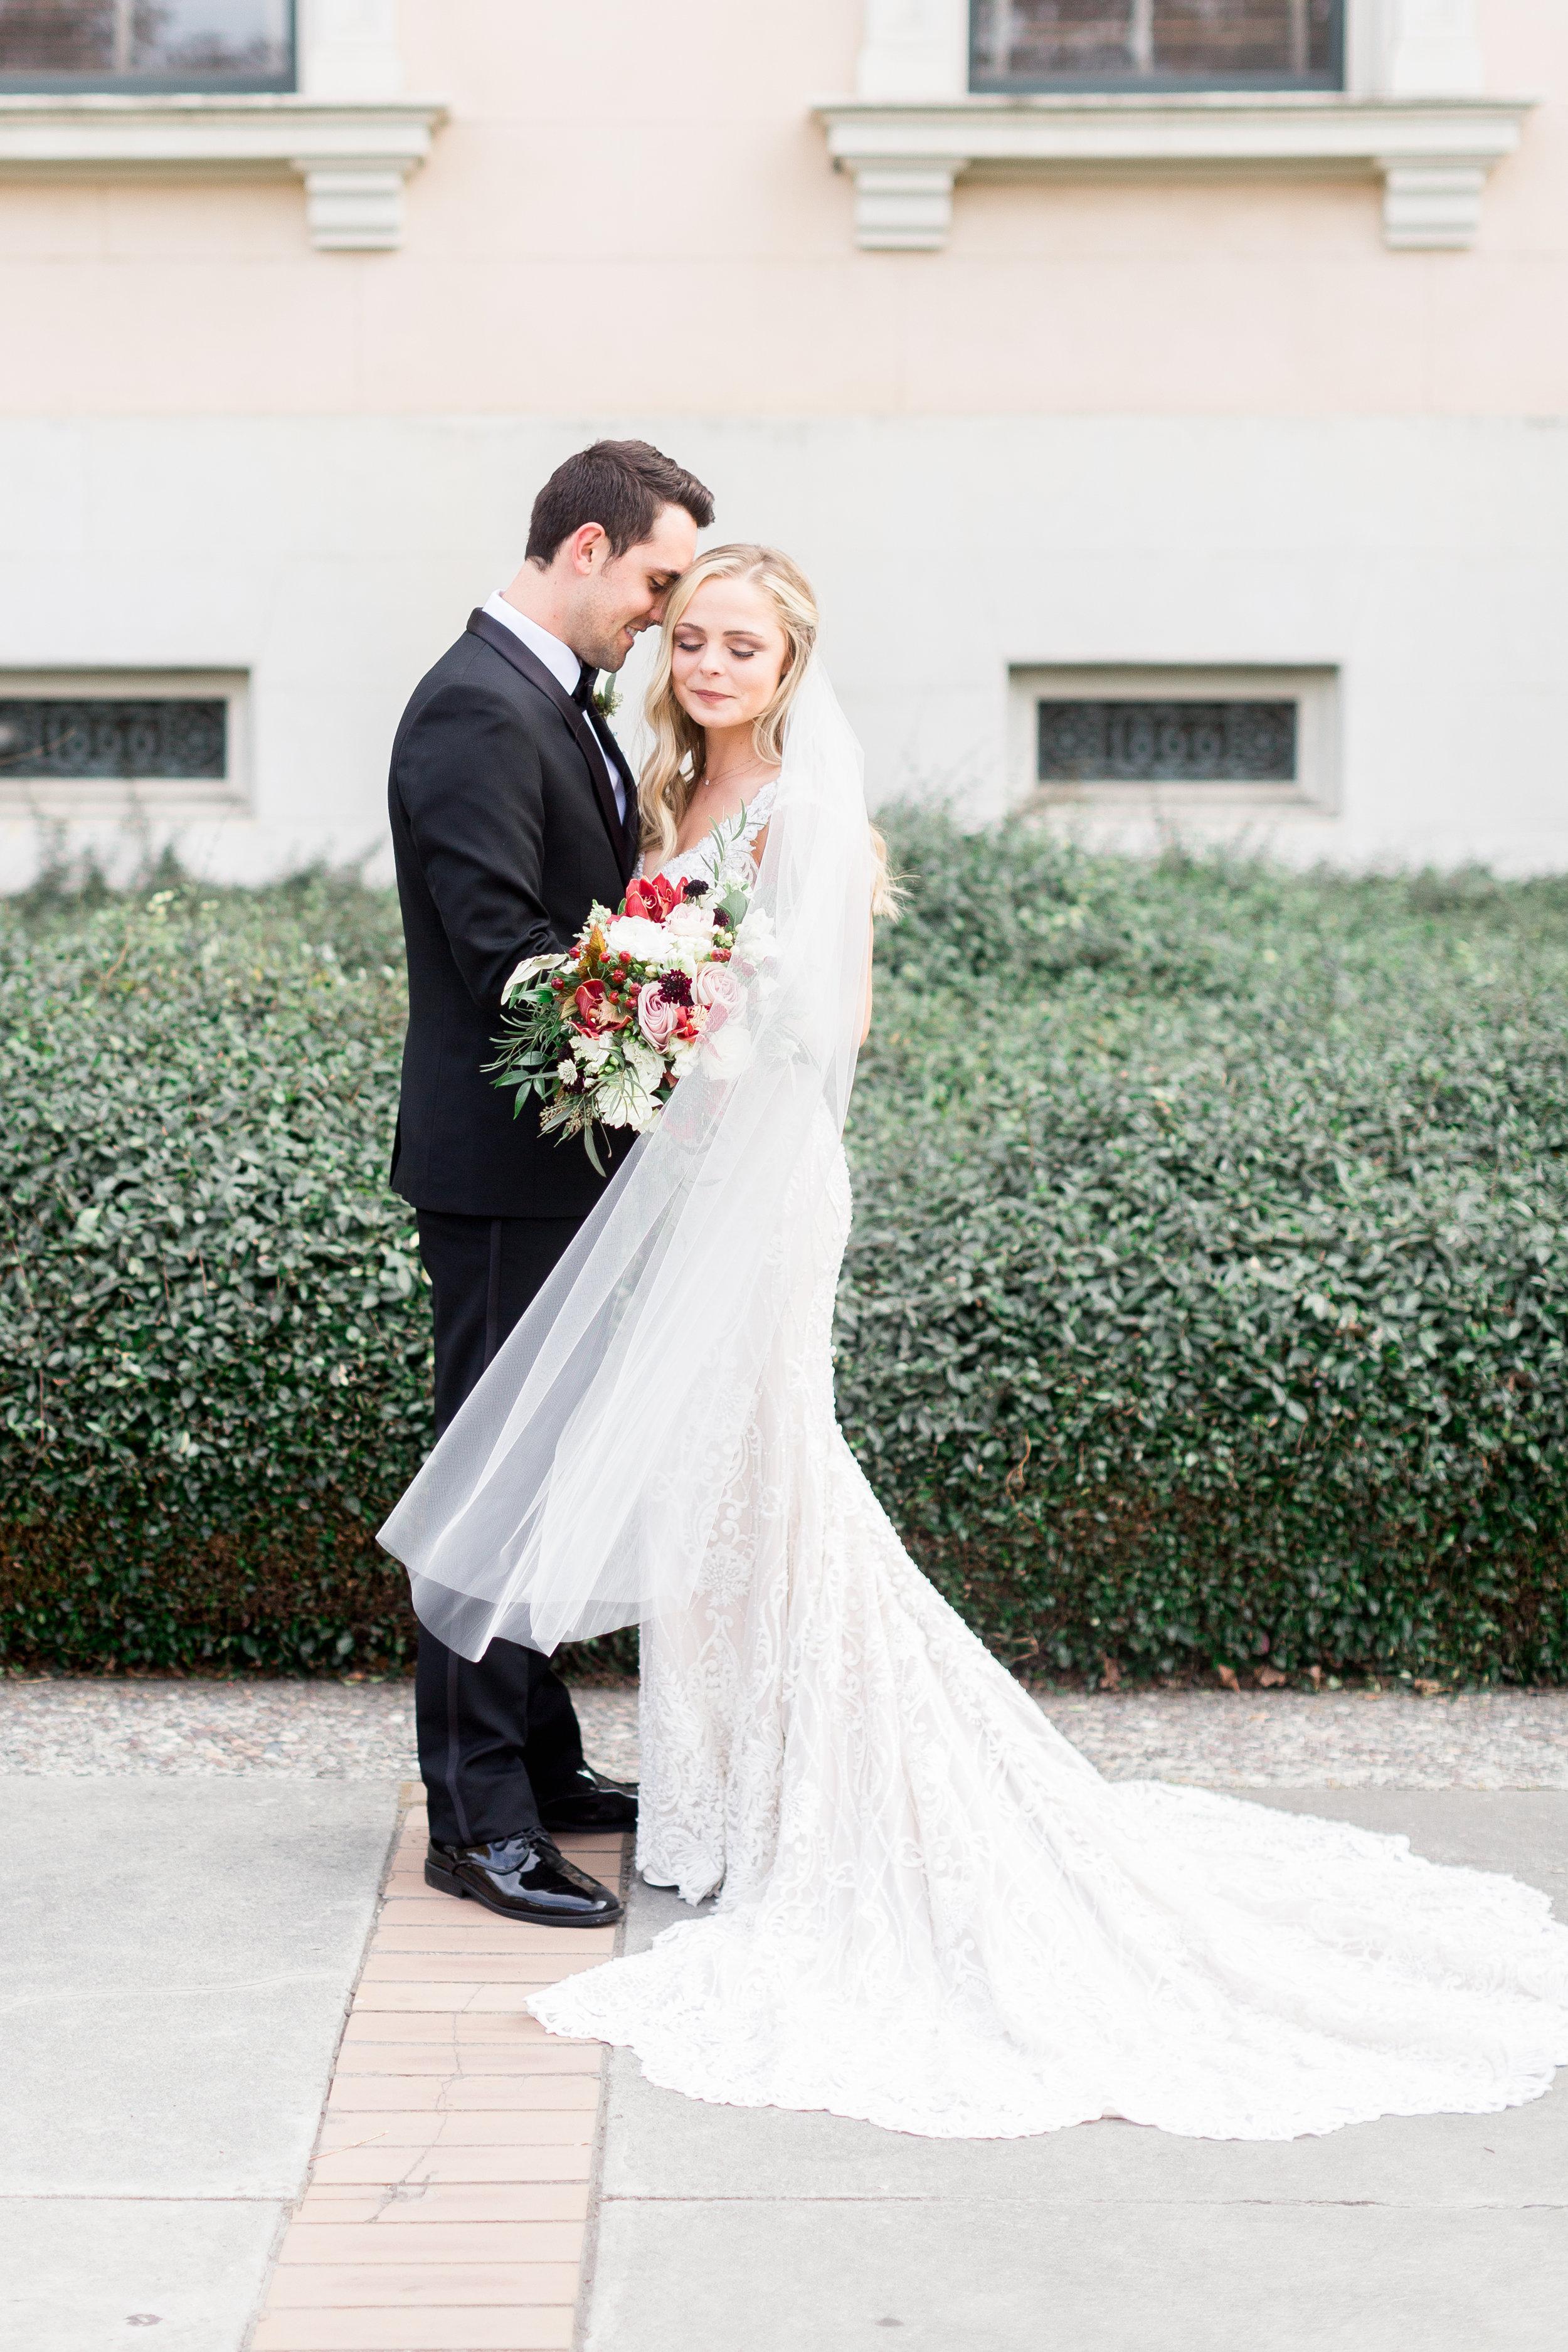 Downtown-San-Jose-wedding-photographer (85 of 335).jpg